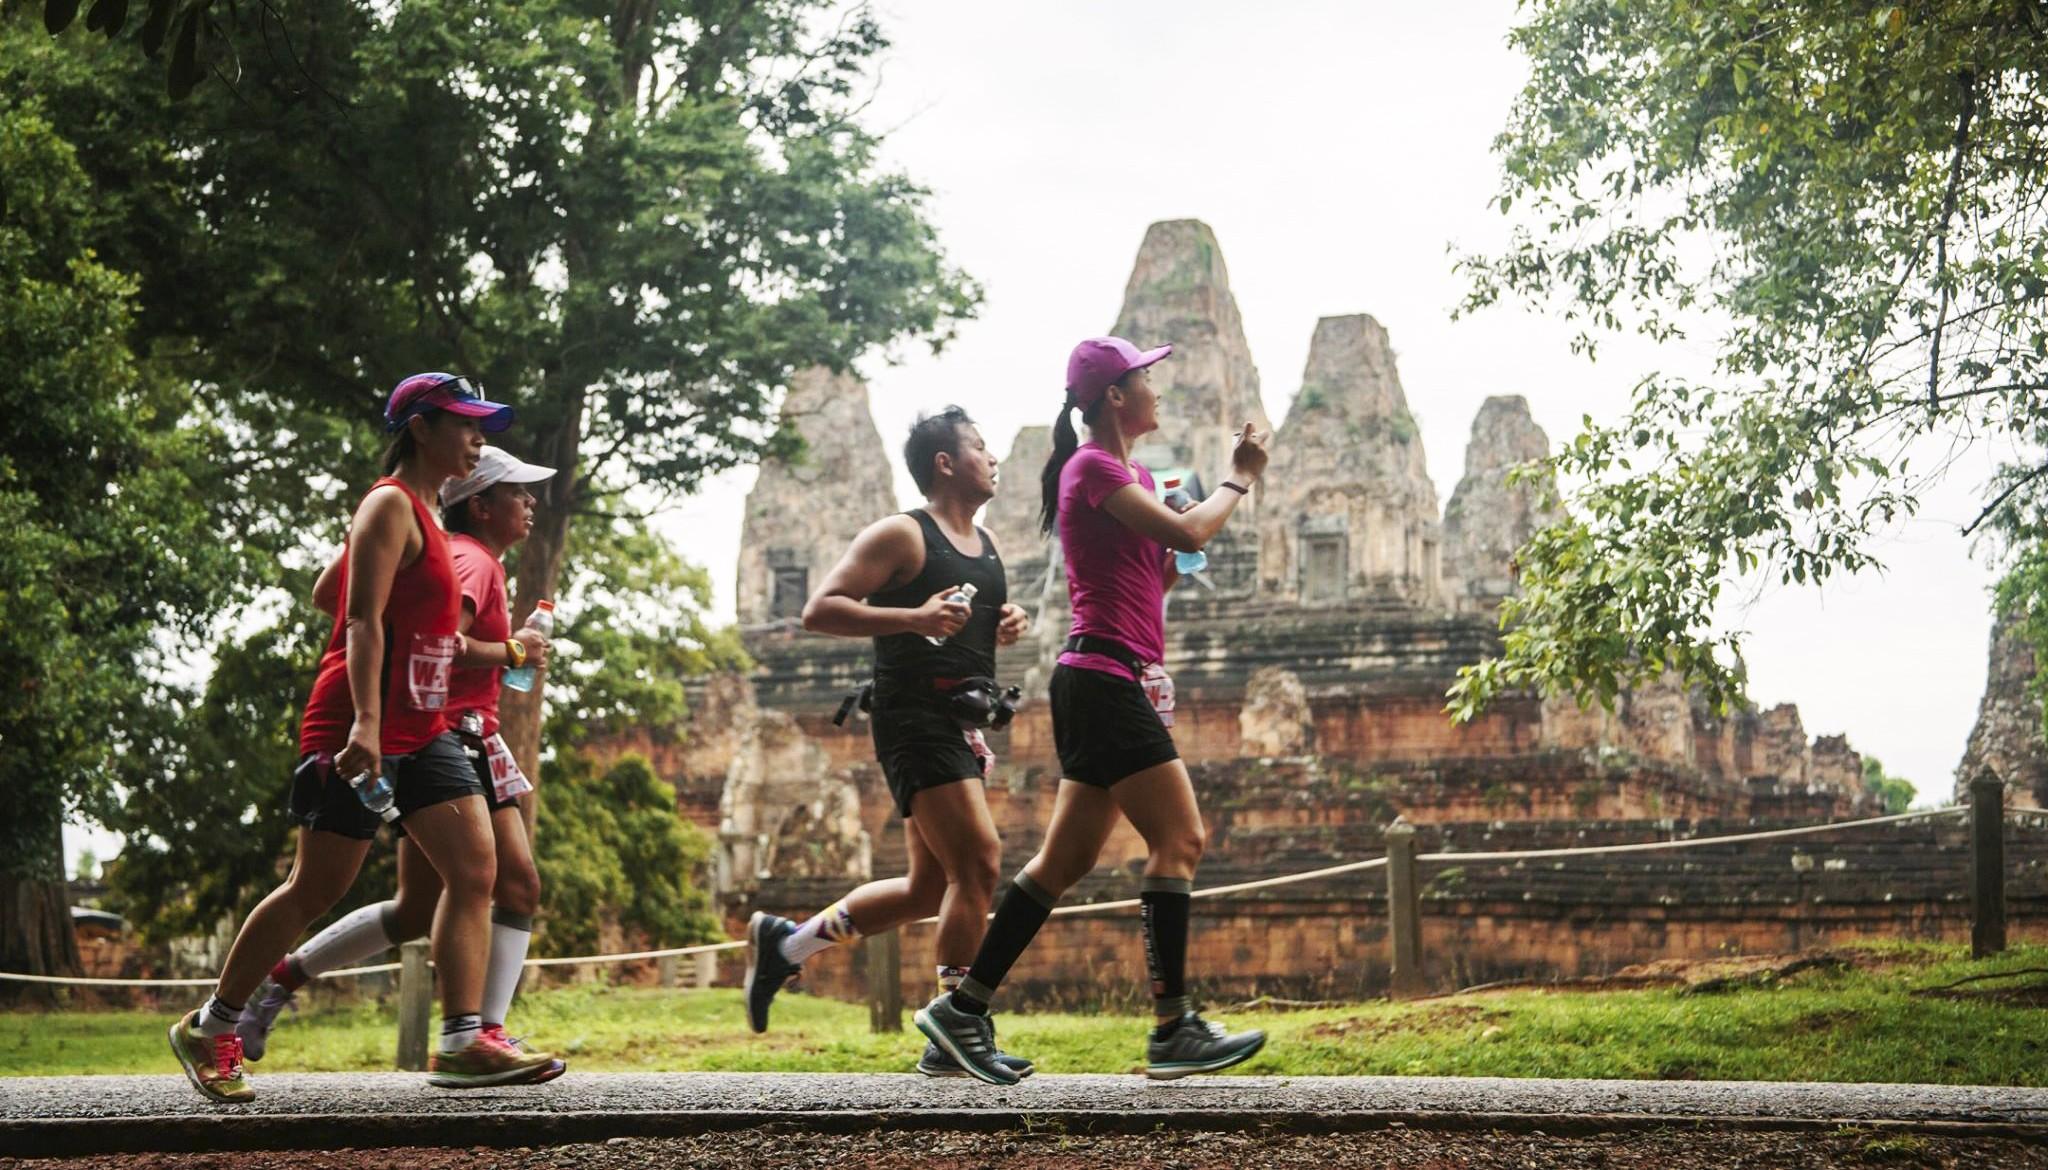 камбоджа, достопримечательности камбоджи, сием рип, марафон, бег